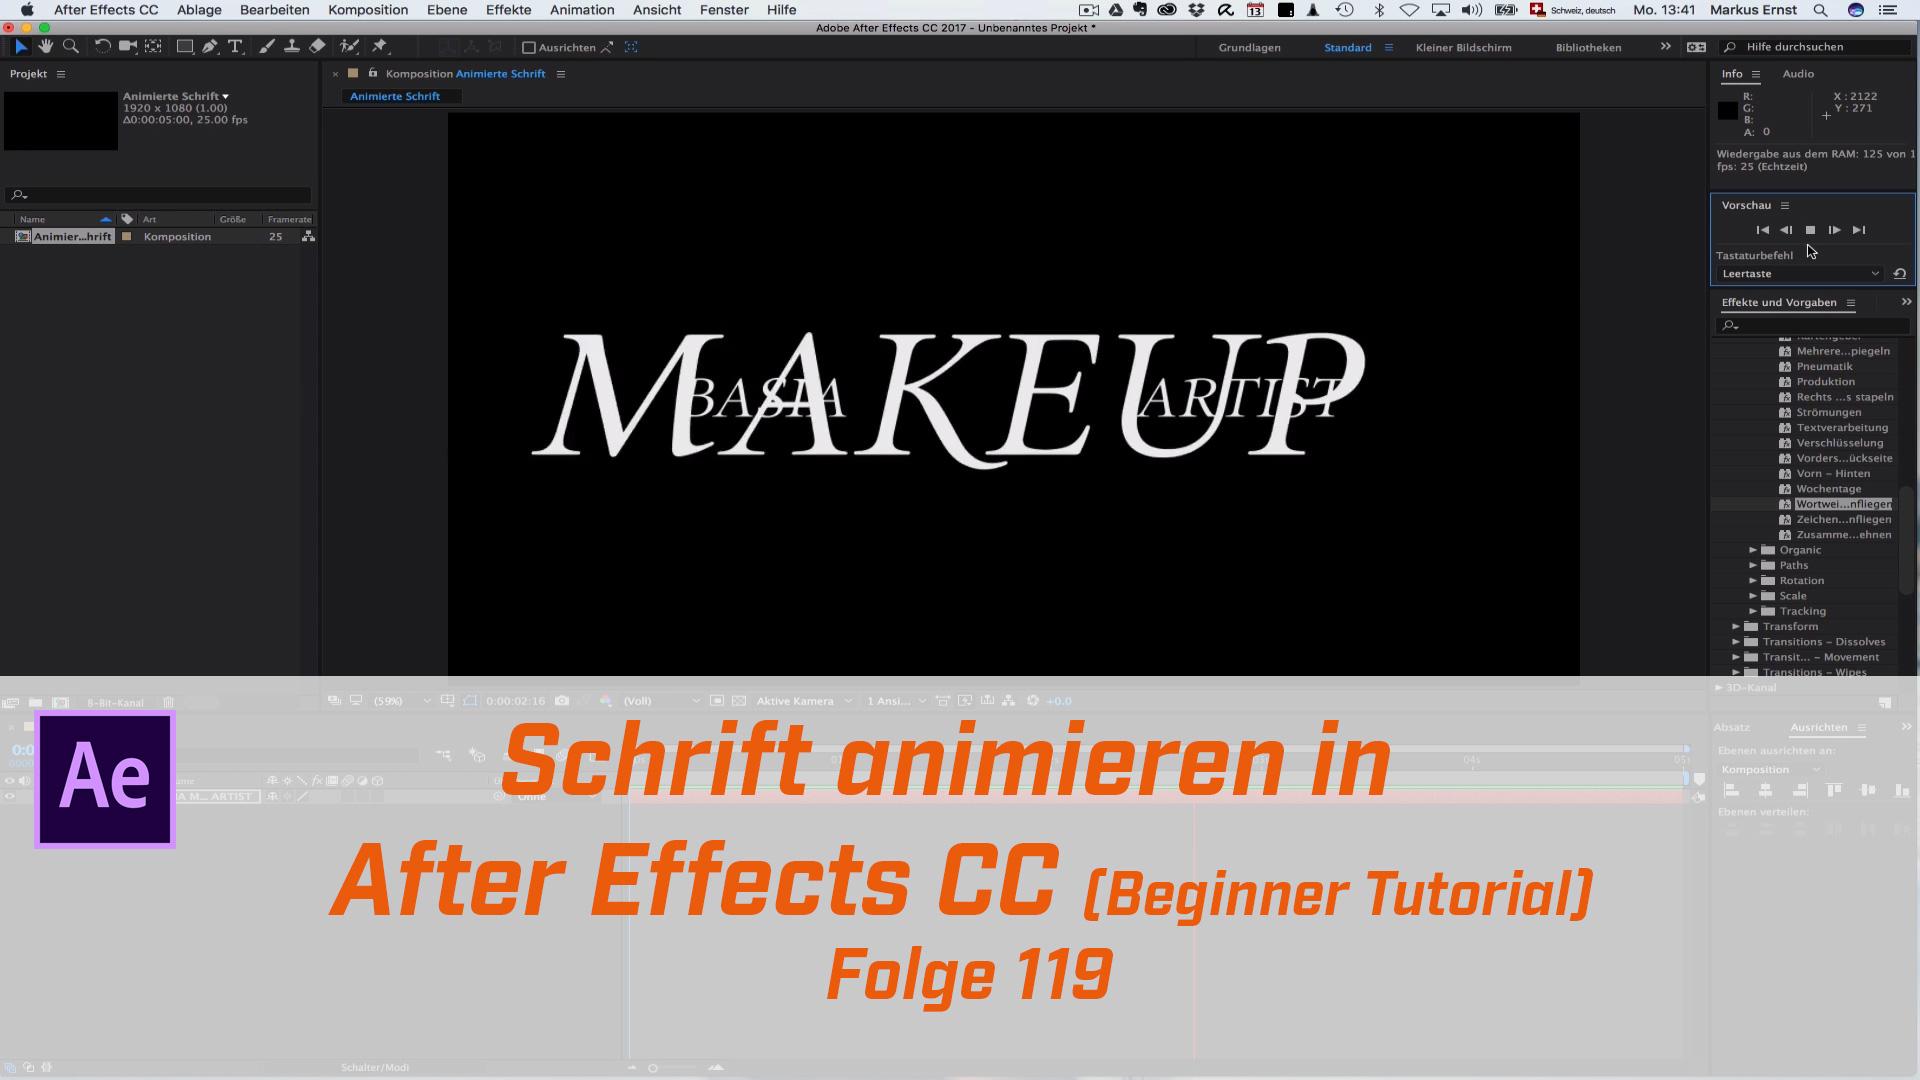 Schrift animieren im After Effects (Beginner Tutorial)